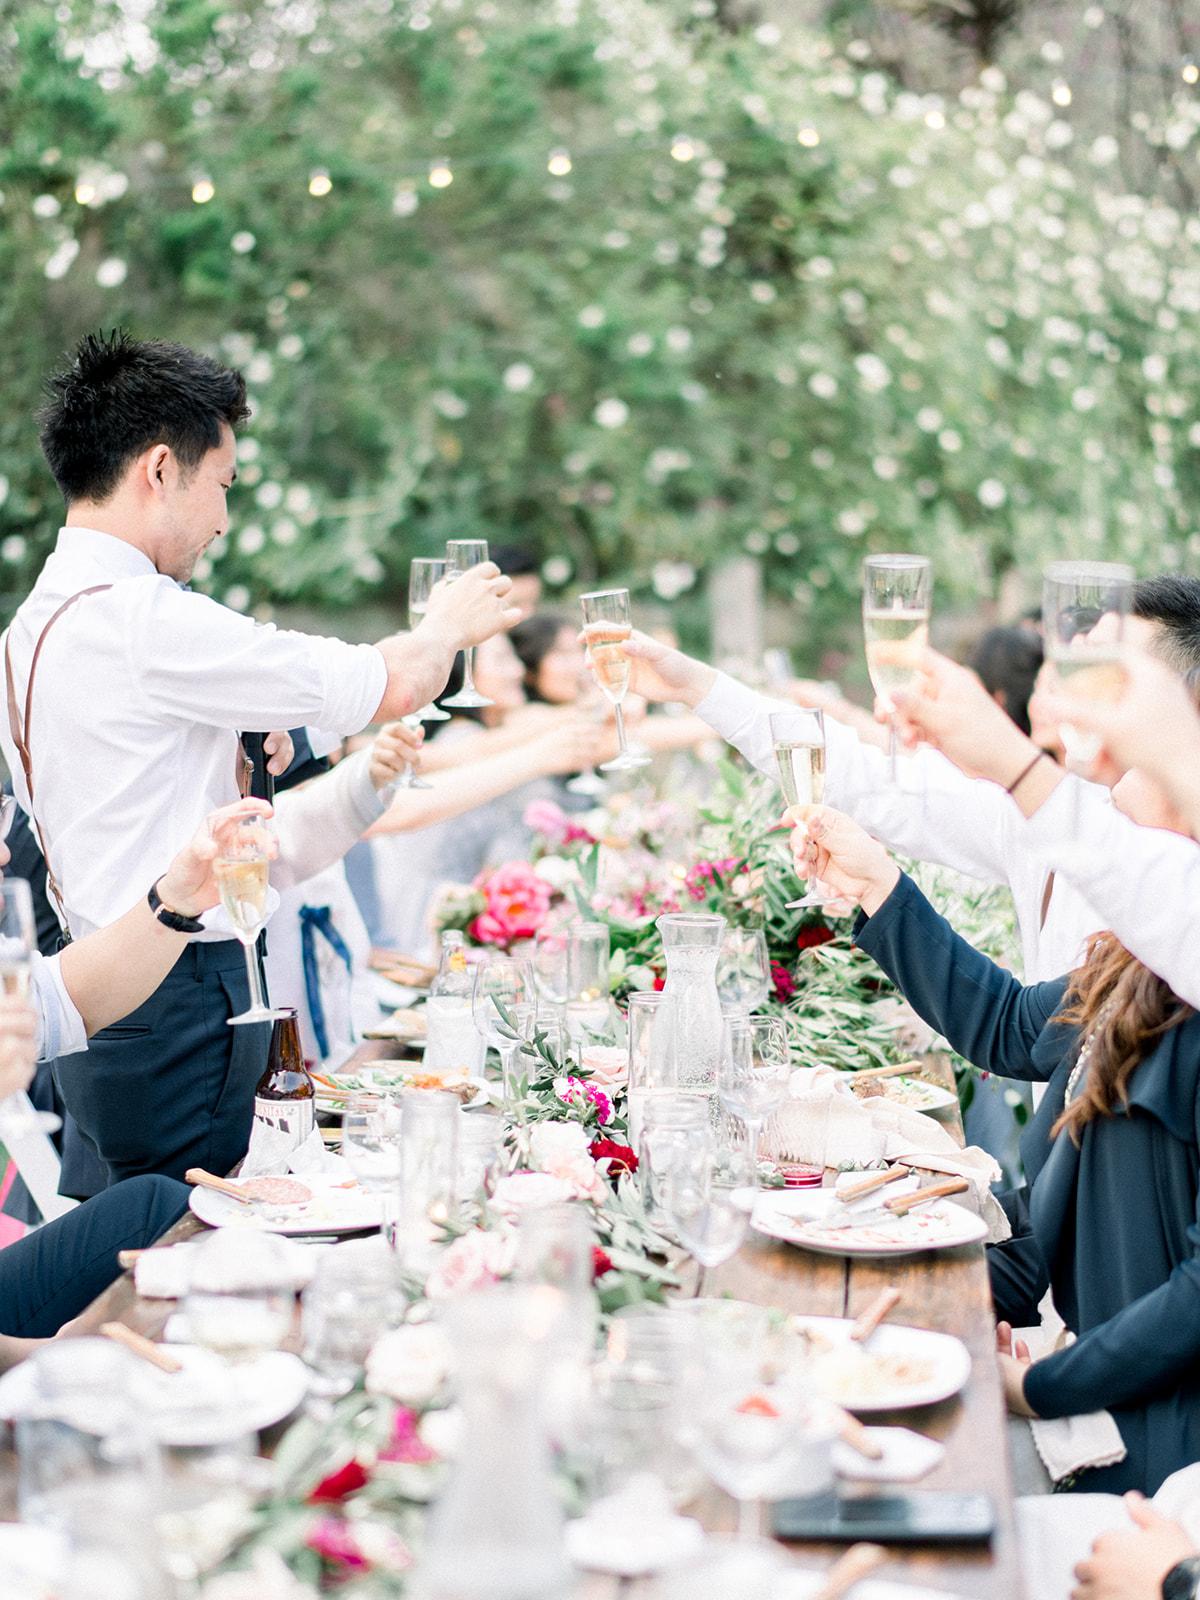 jueunandjon-etherandsmith-wedding-1464.jpg